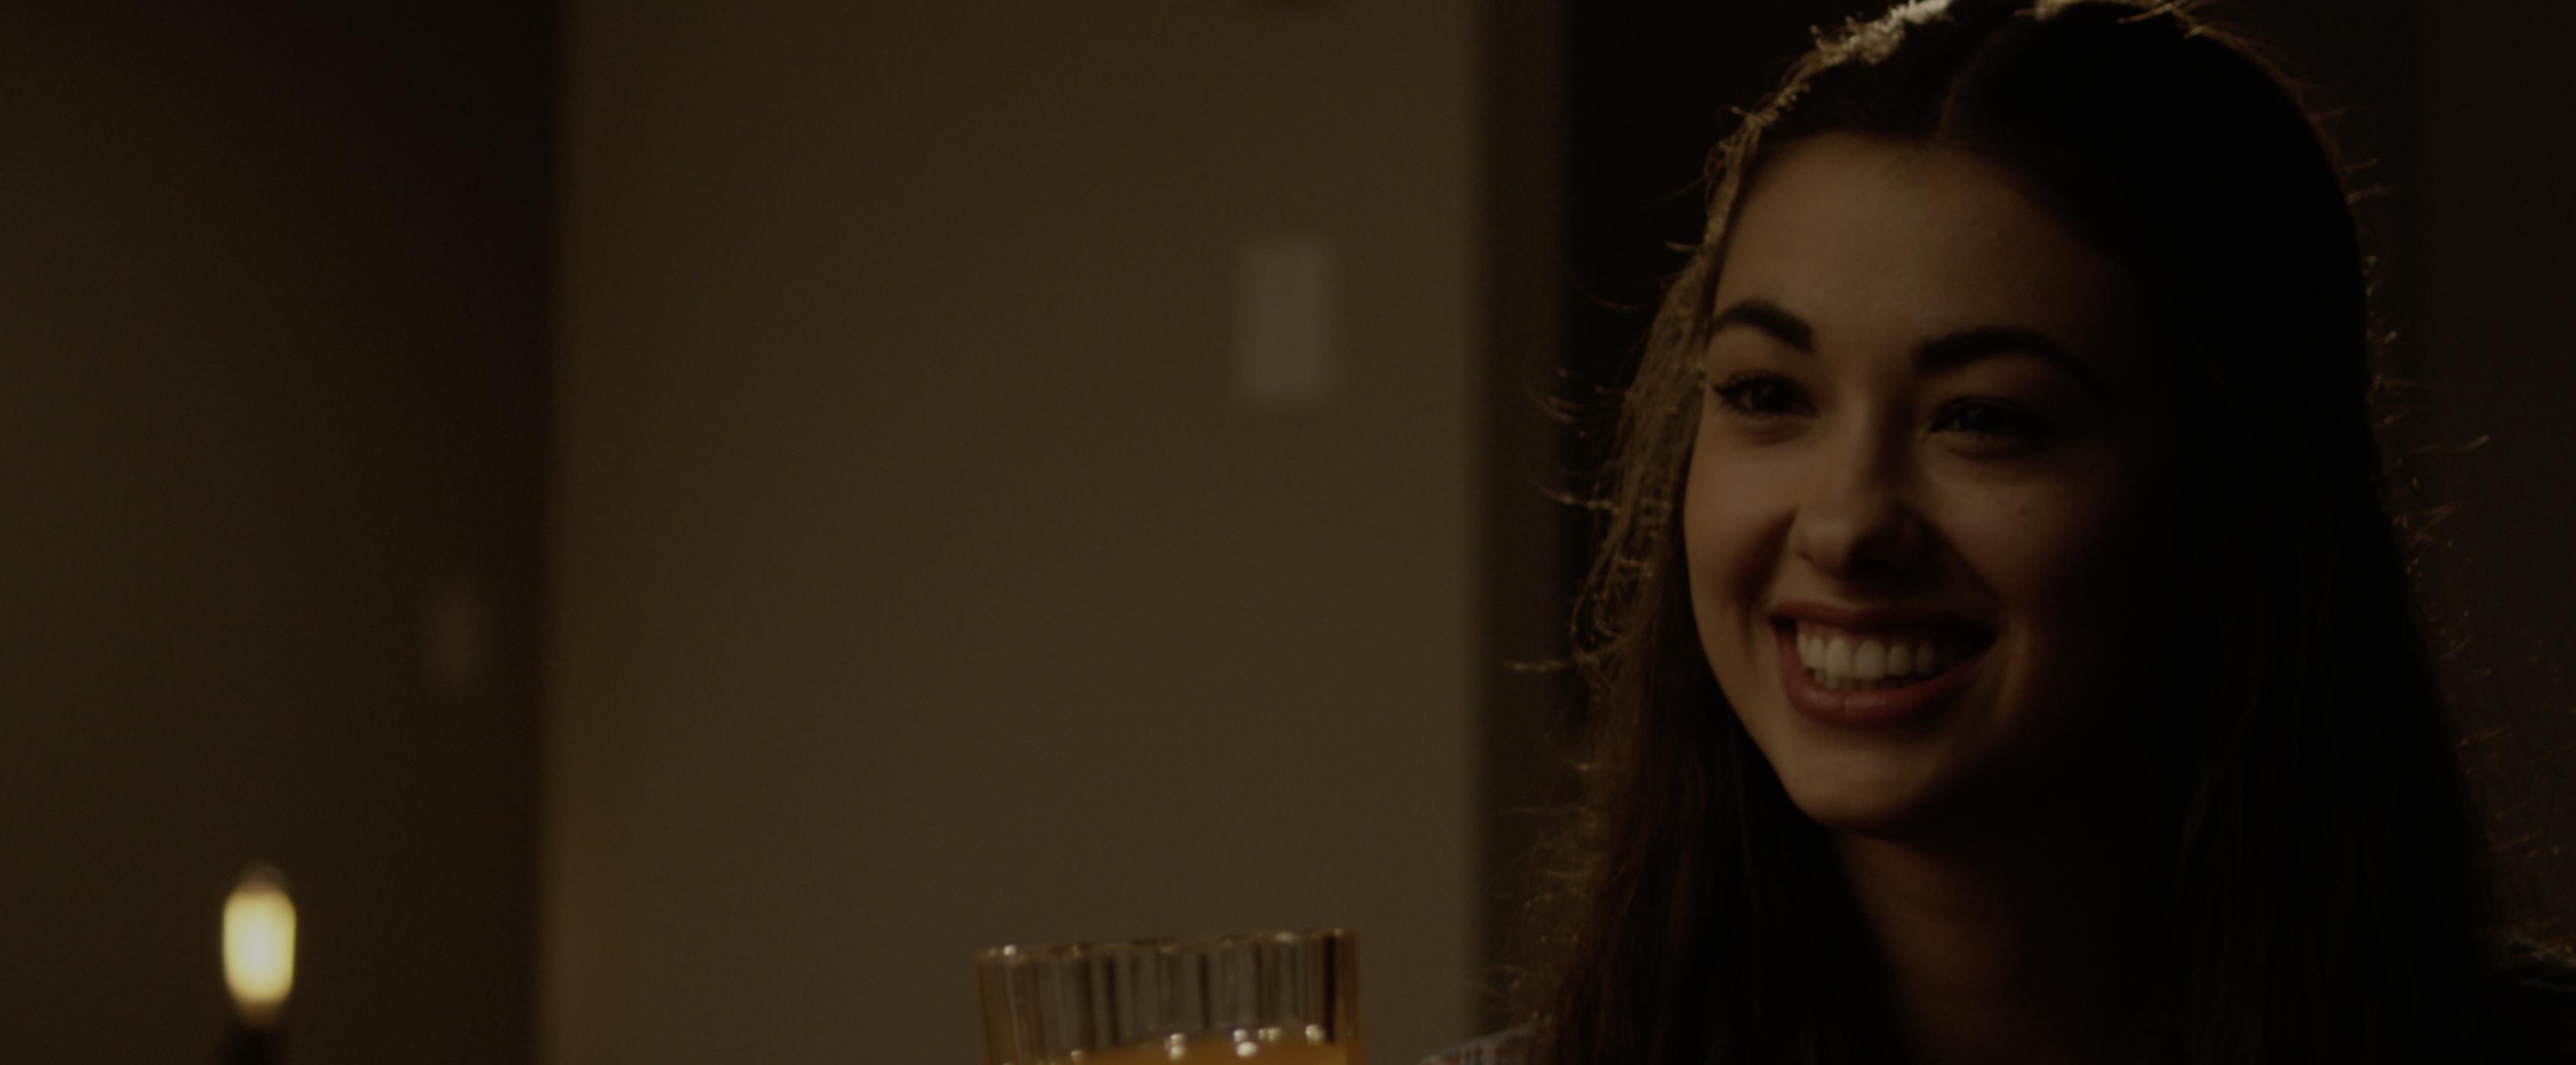 Harriet Weaver as Lily 2